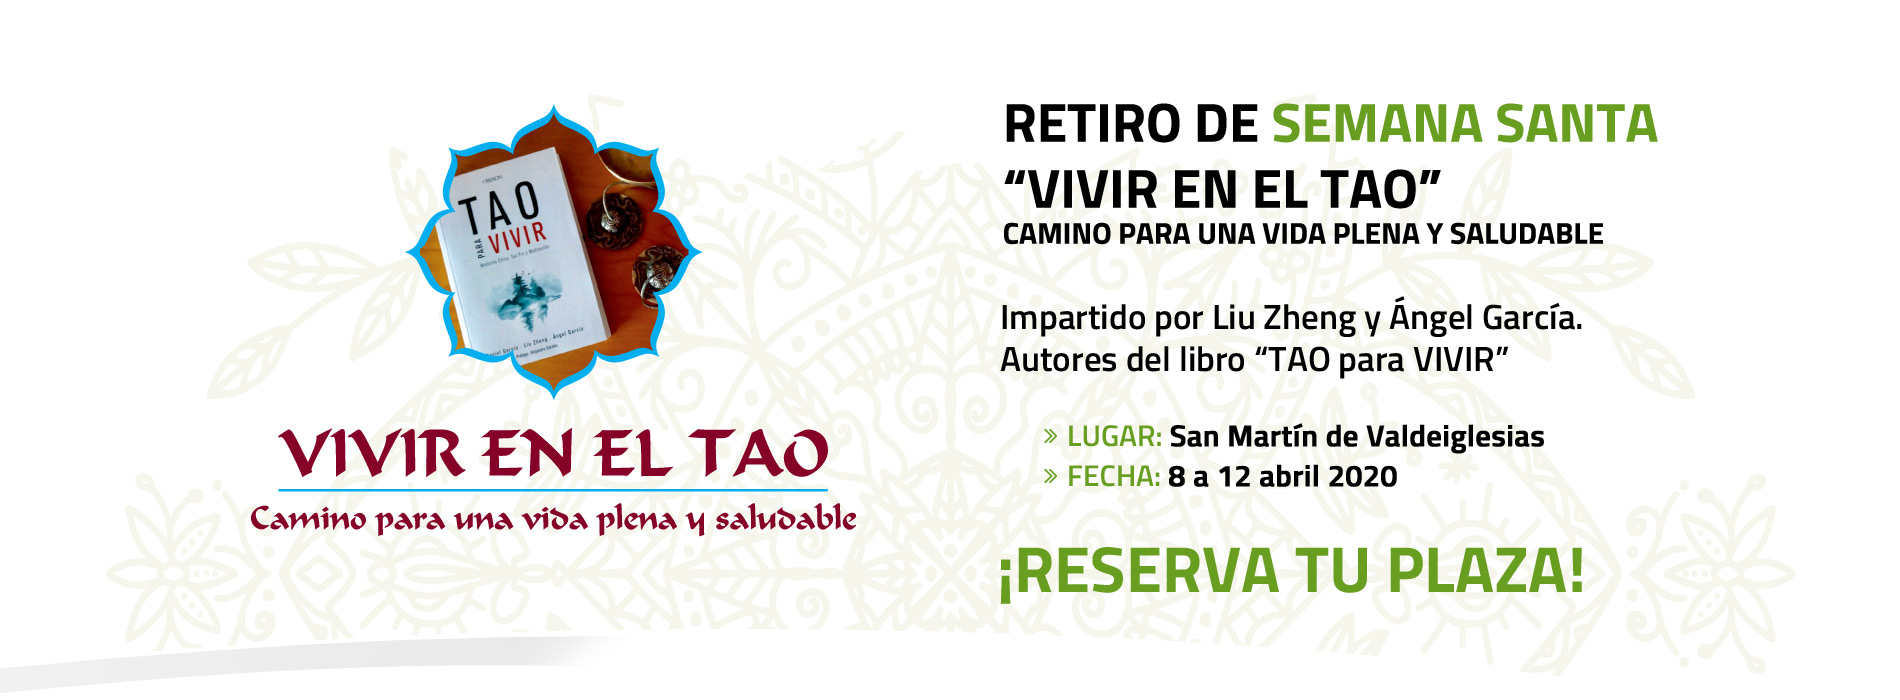 "Retiro "" Vivir en el Tao"" (Semana Santa – Del 8 al 12 de abril 2020)"